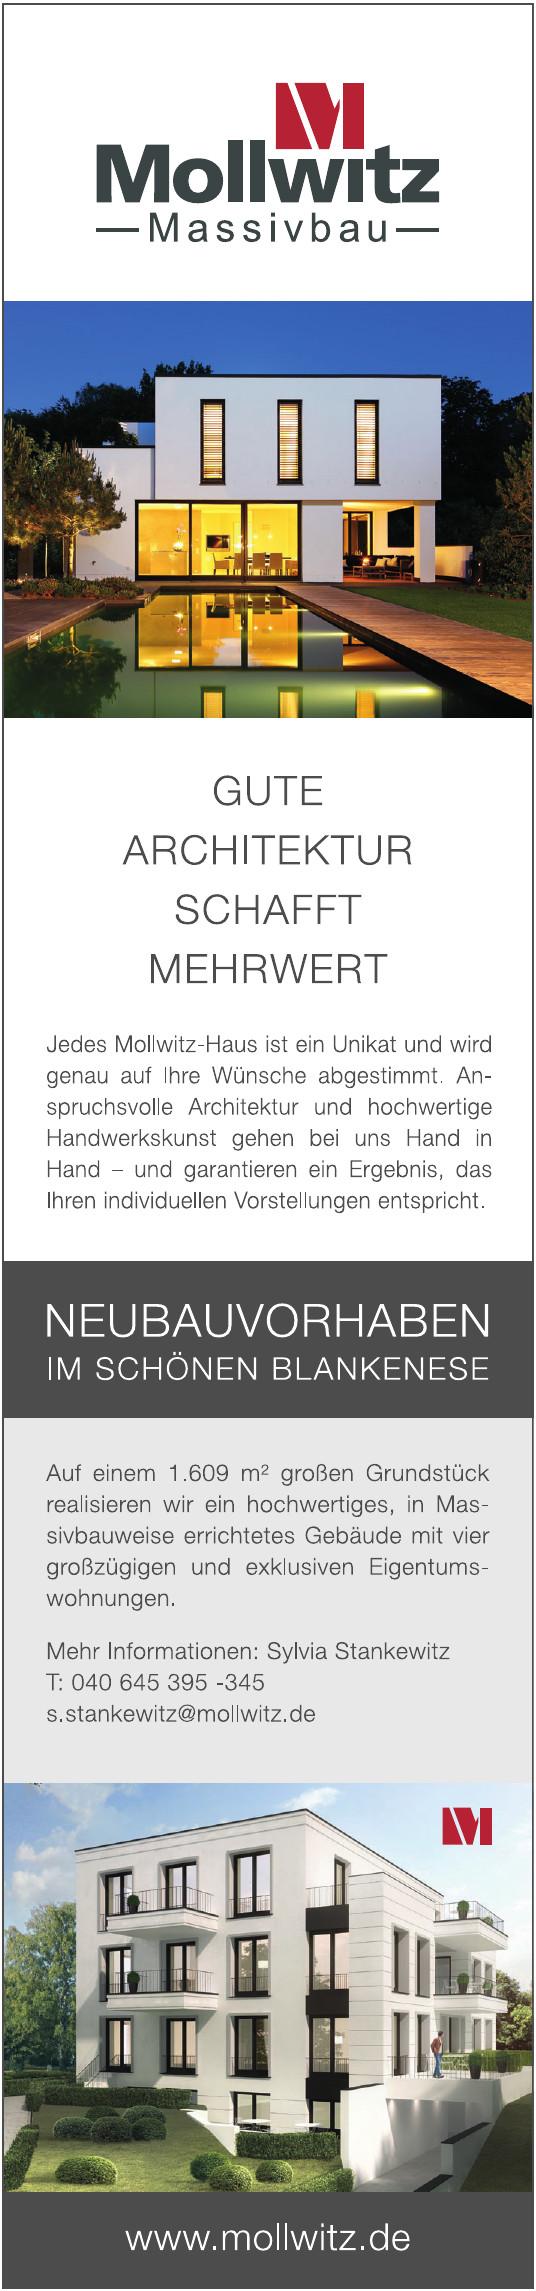 Mollwitz Massivbau